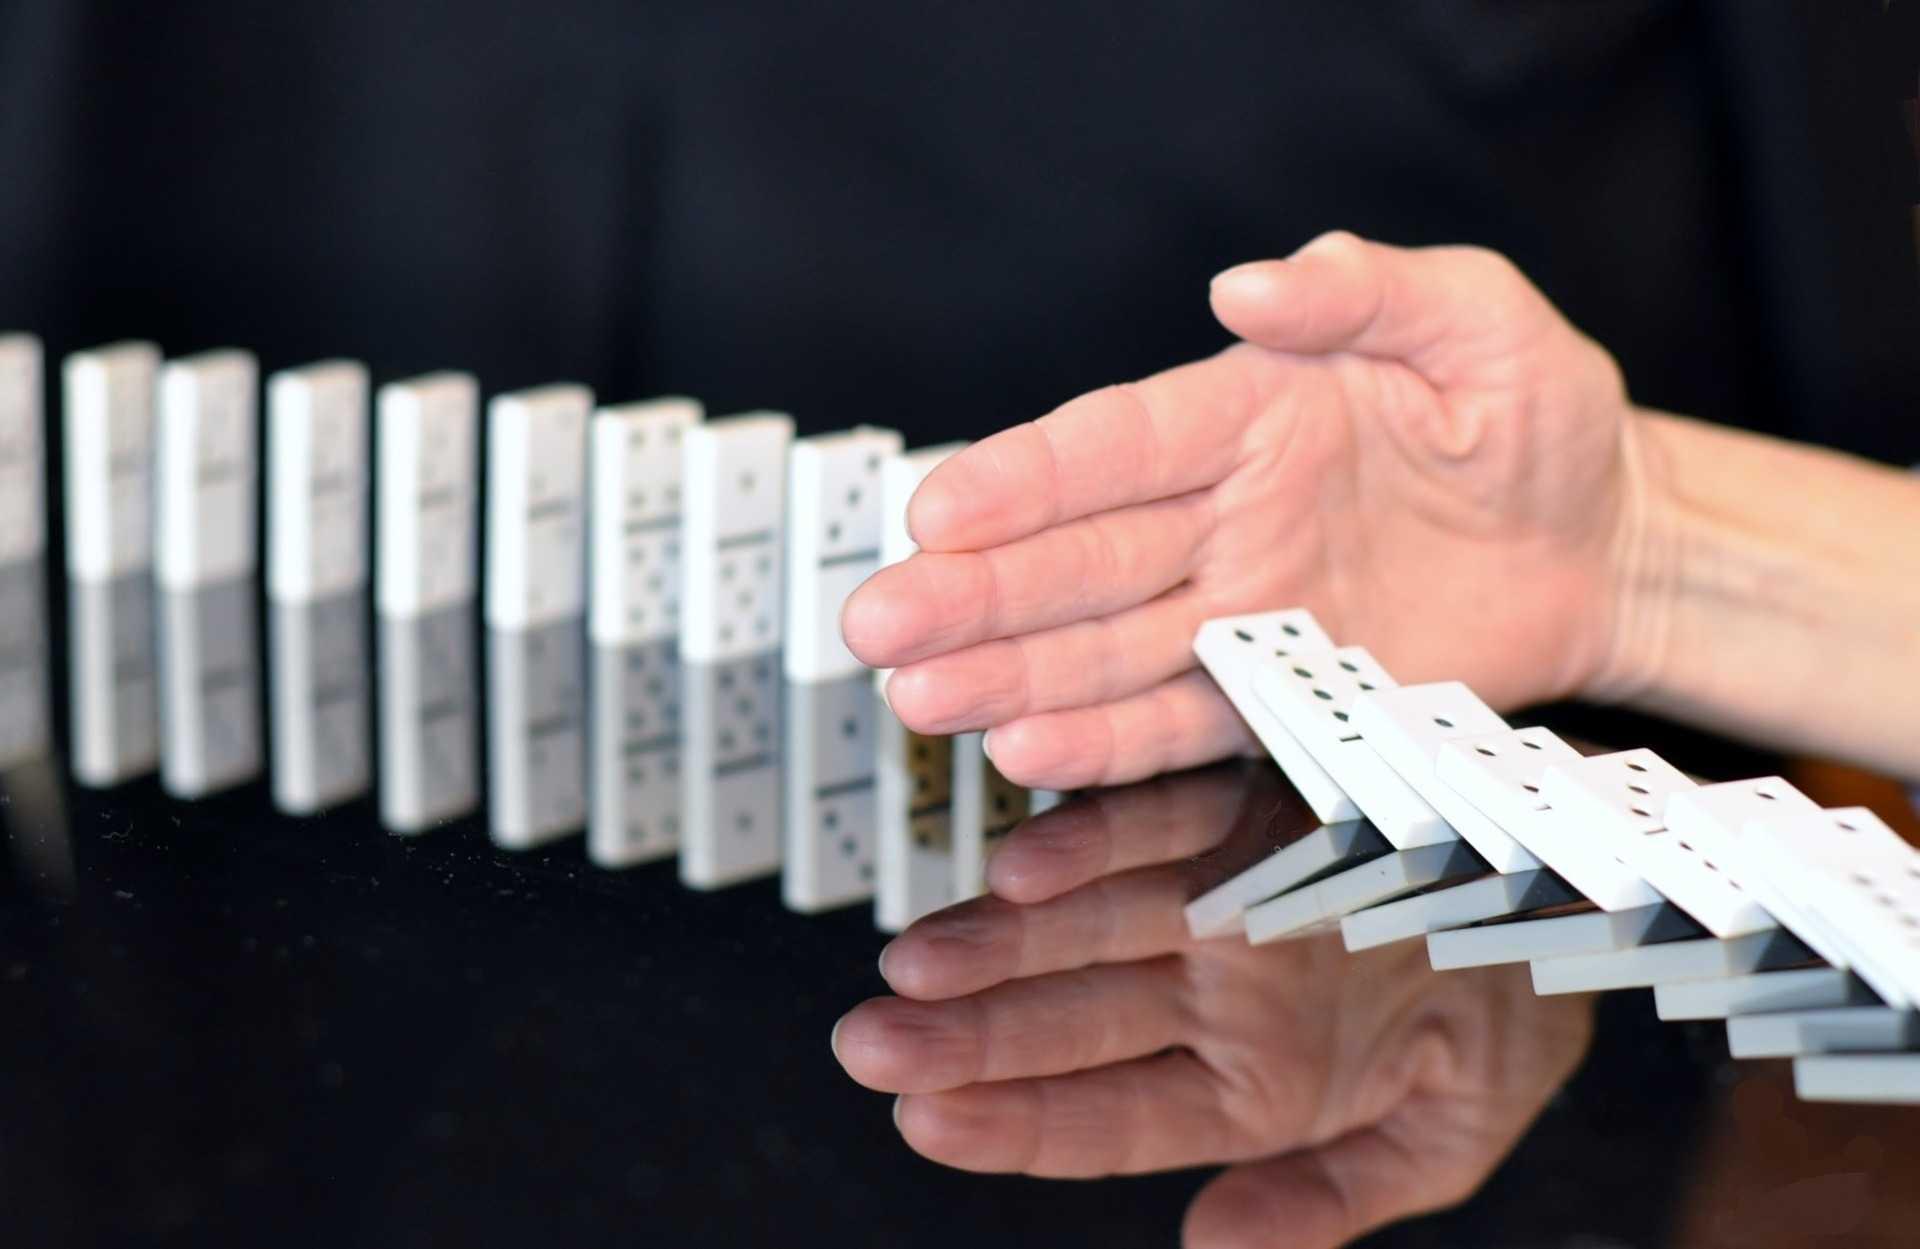 korrupcio allj, stop, domino, folyamat